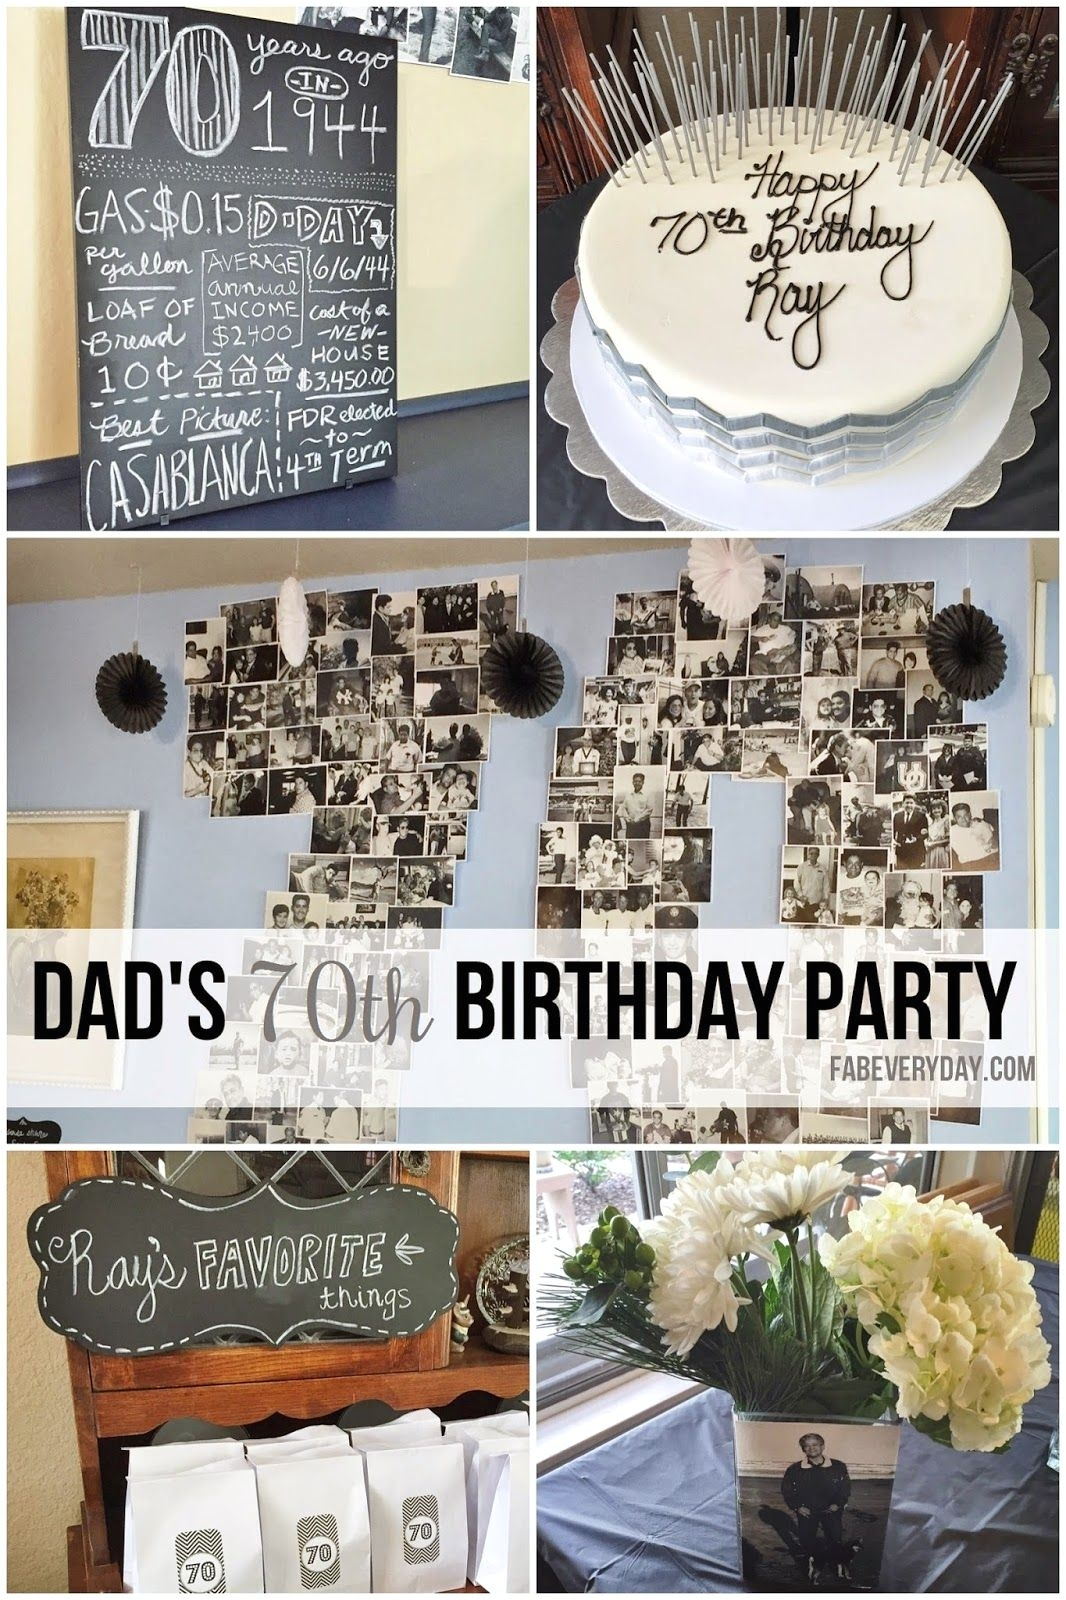 65 Birthday Decorations Canada Milestone Planning My Dad S 70th Party